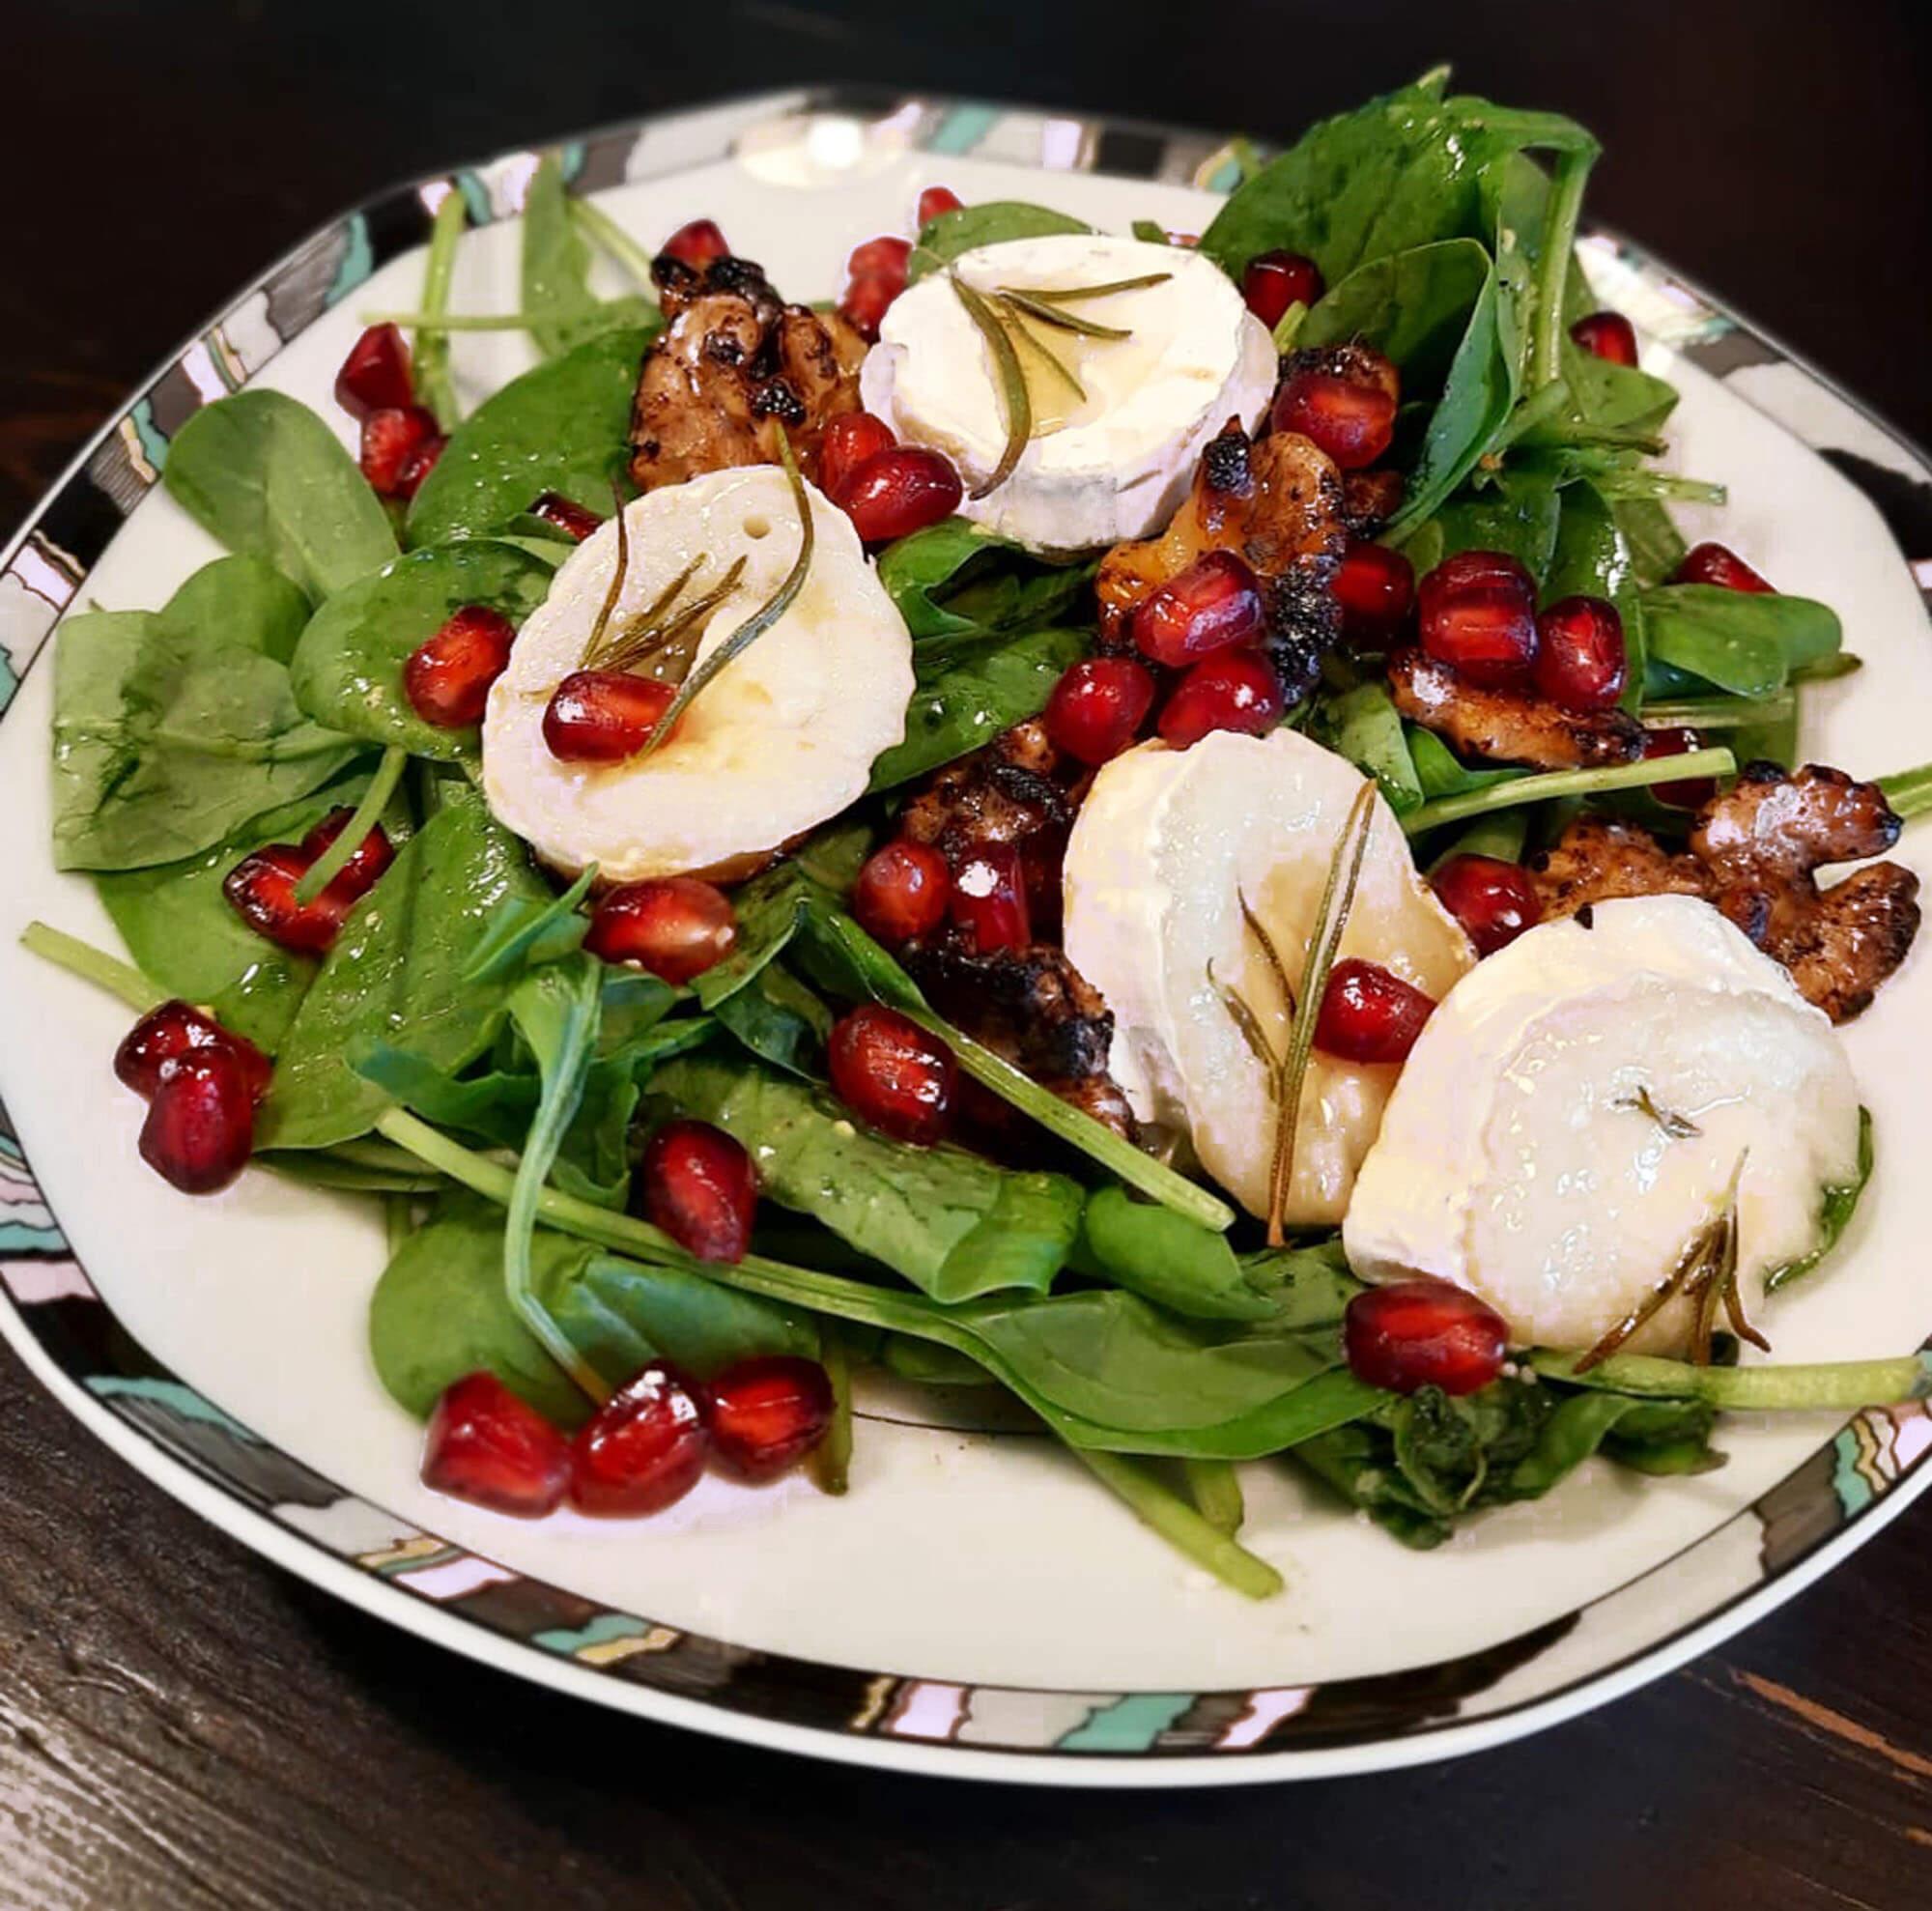 09_ Spinat-Granatapfelkerne-Ziegenkäse-Salat (LT)